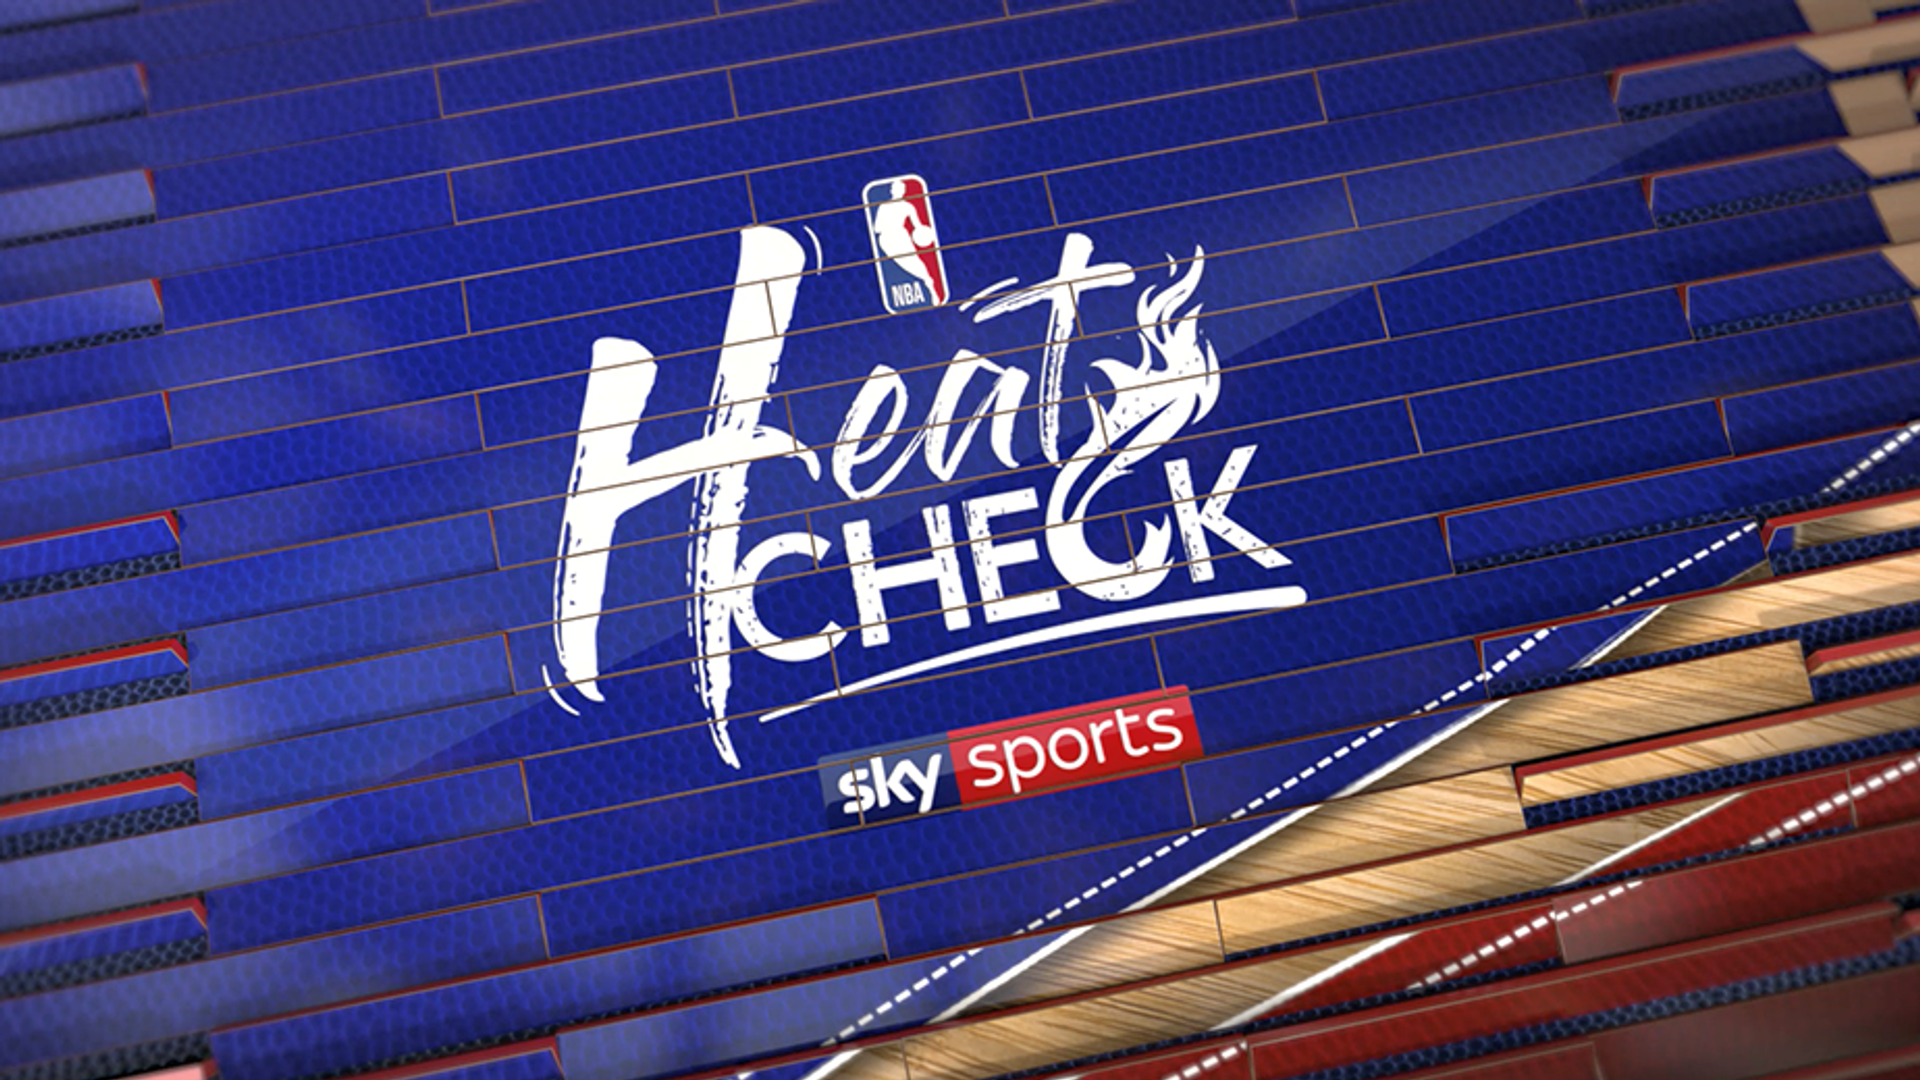 Watch Sky Sports Heatcheck on YouTube